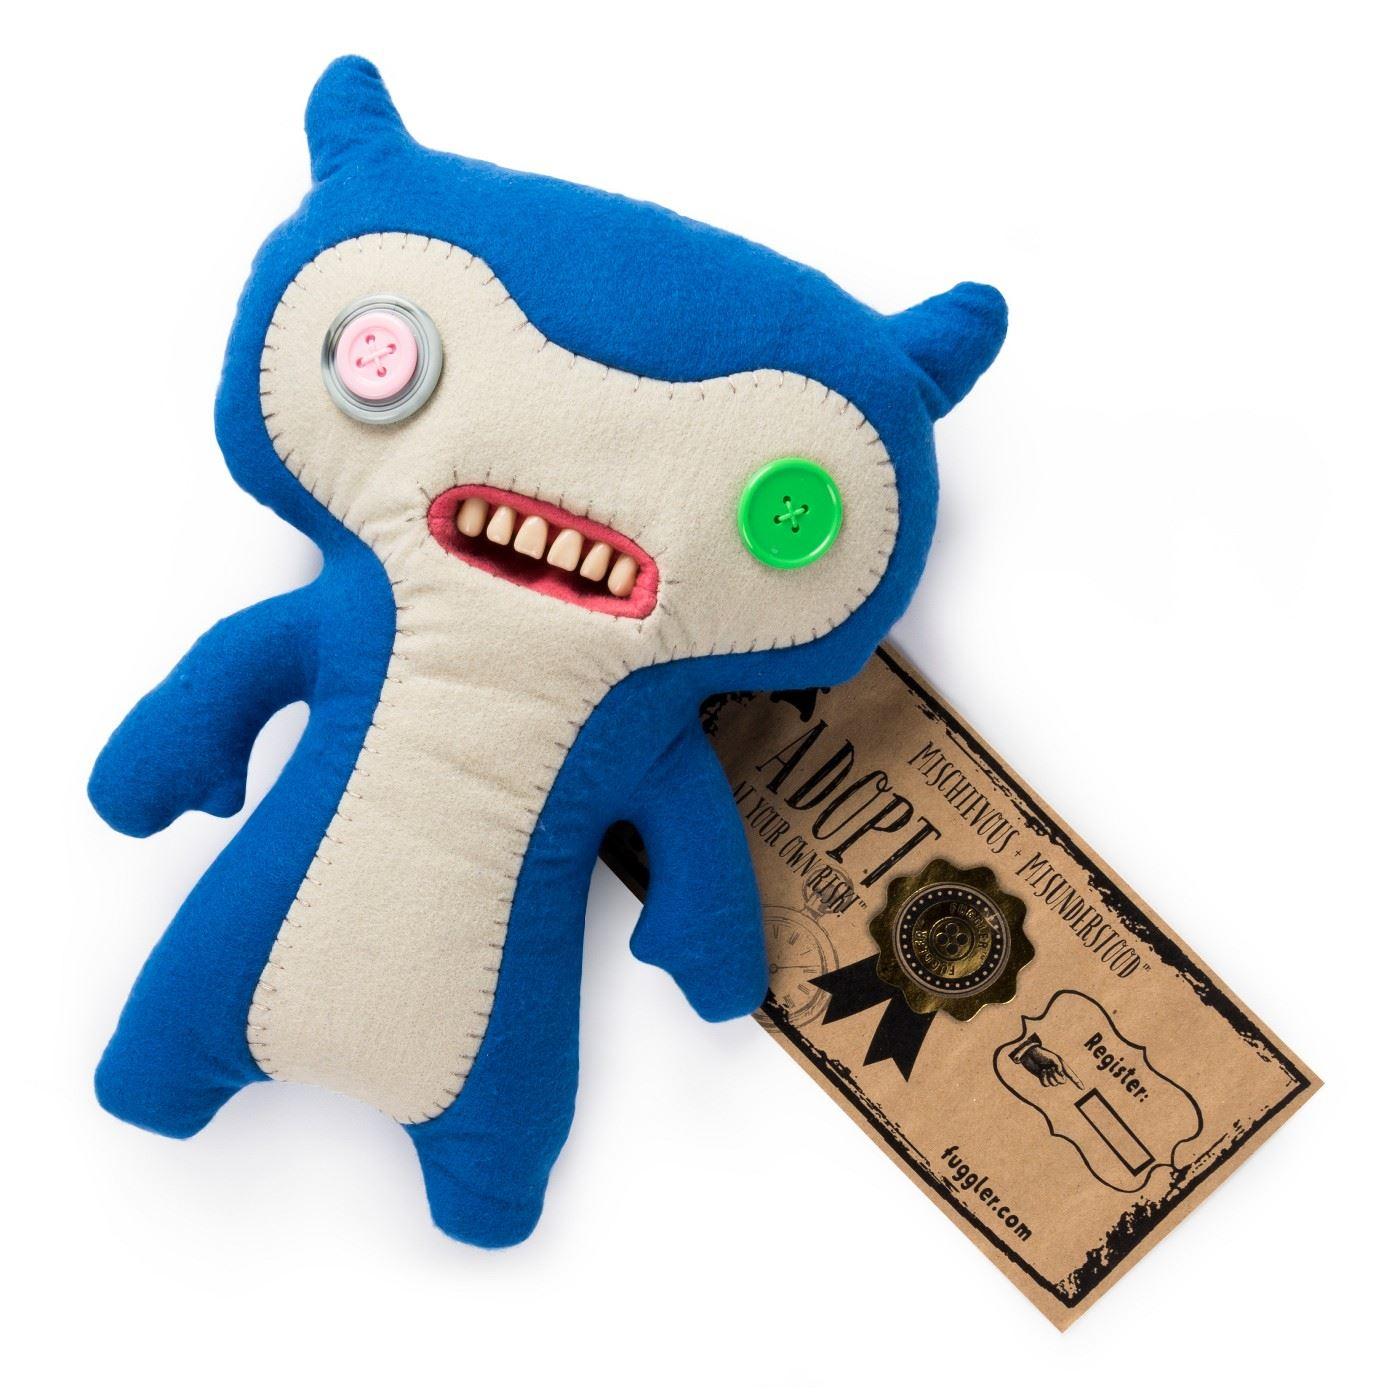 Fuggler-Funny-Uggly-Monsters-Blue-Red-Purple-Light-Red-Stuffed-Animal 縮圖 3